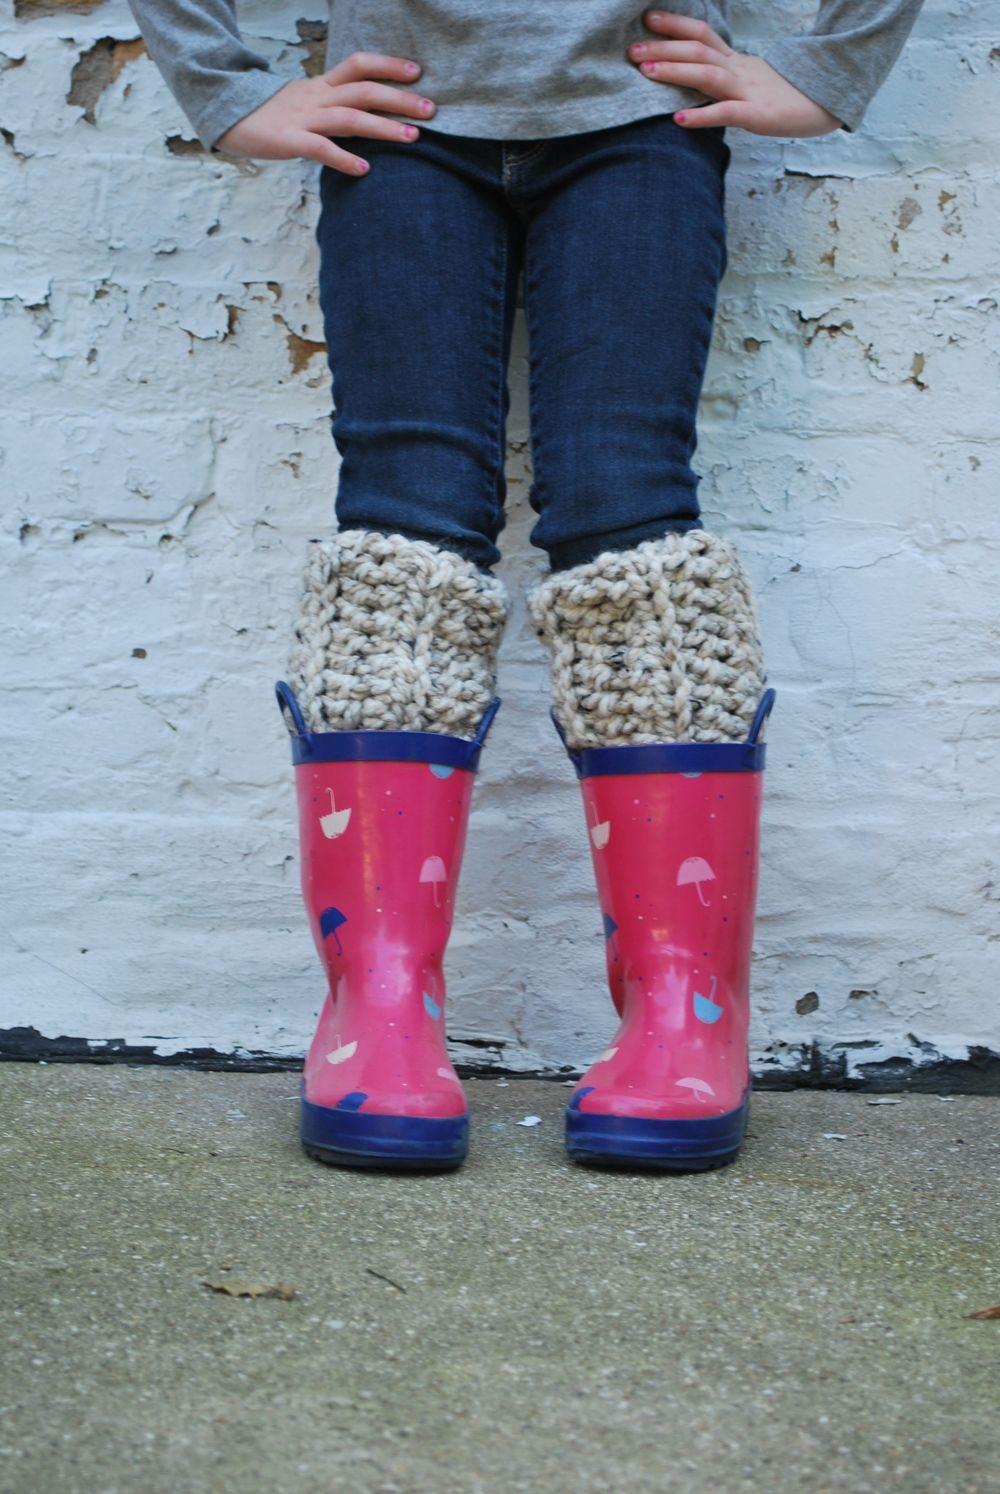 Free chunky crochet leg warmers pattern from ashley lillis free chunky crochet leg warmers pattern from ashley lillis bankloansurffo Choice Image